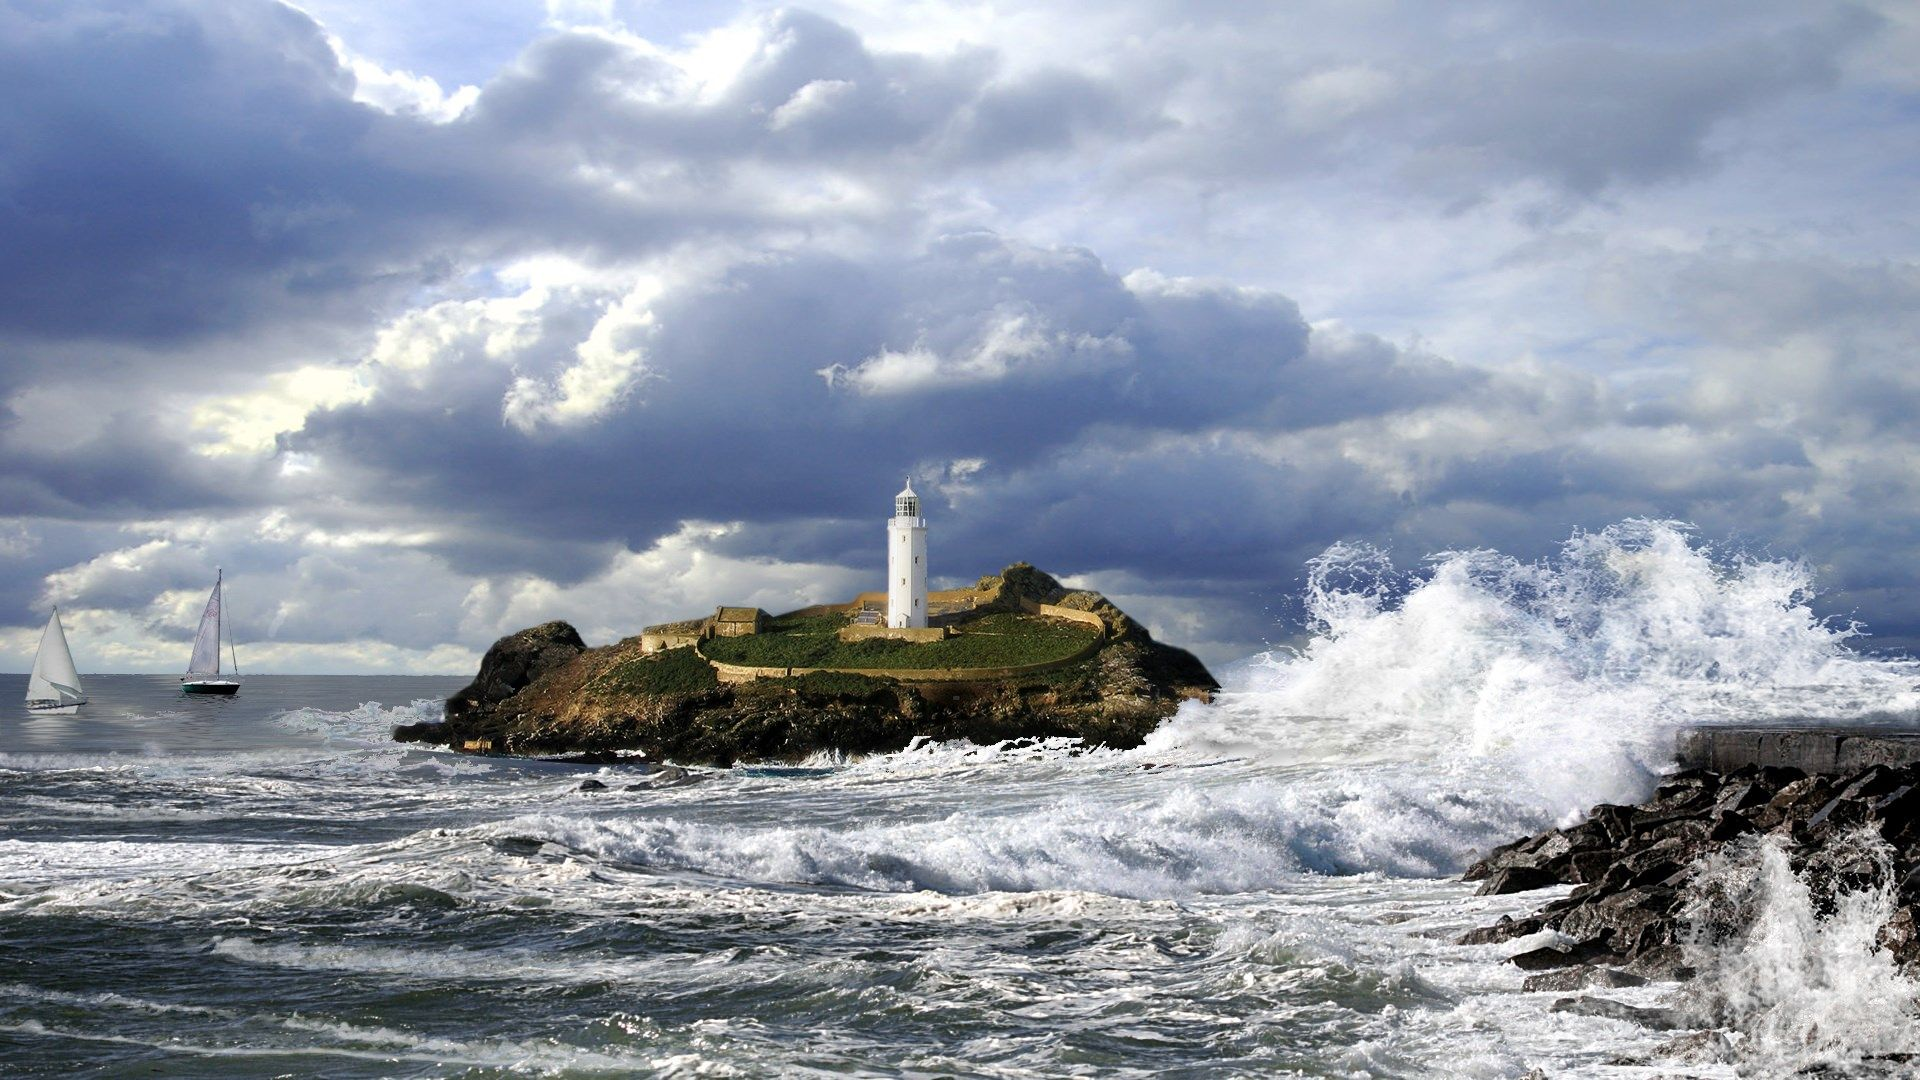 Lighthouse Screensaver Fall - Lighting